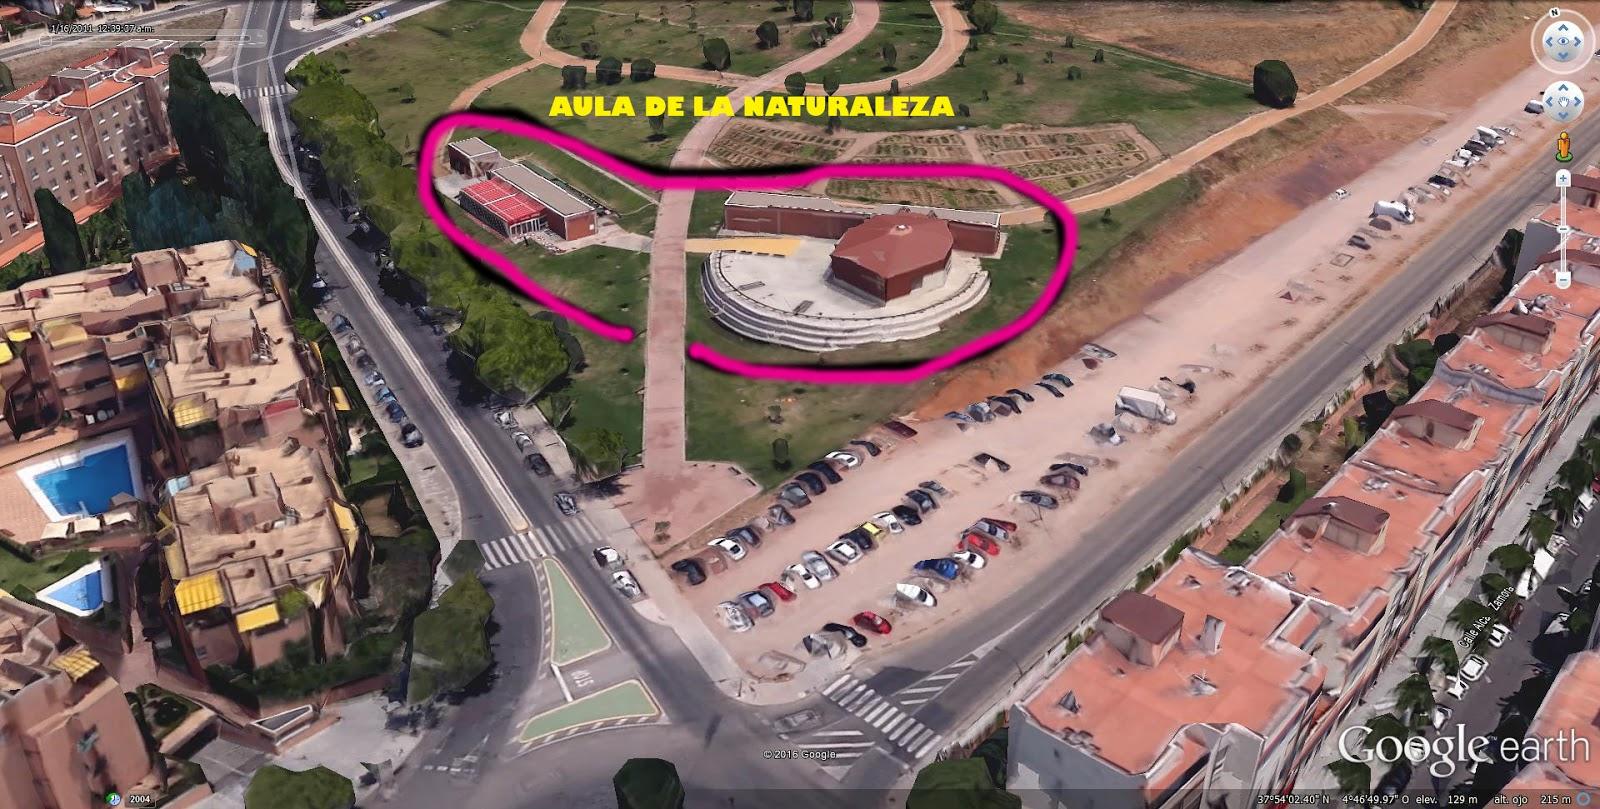 VI mesa mineralogica de Córdoba Asomadilla